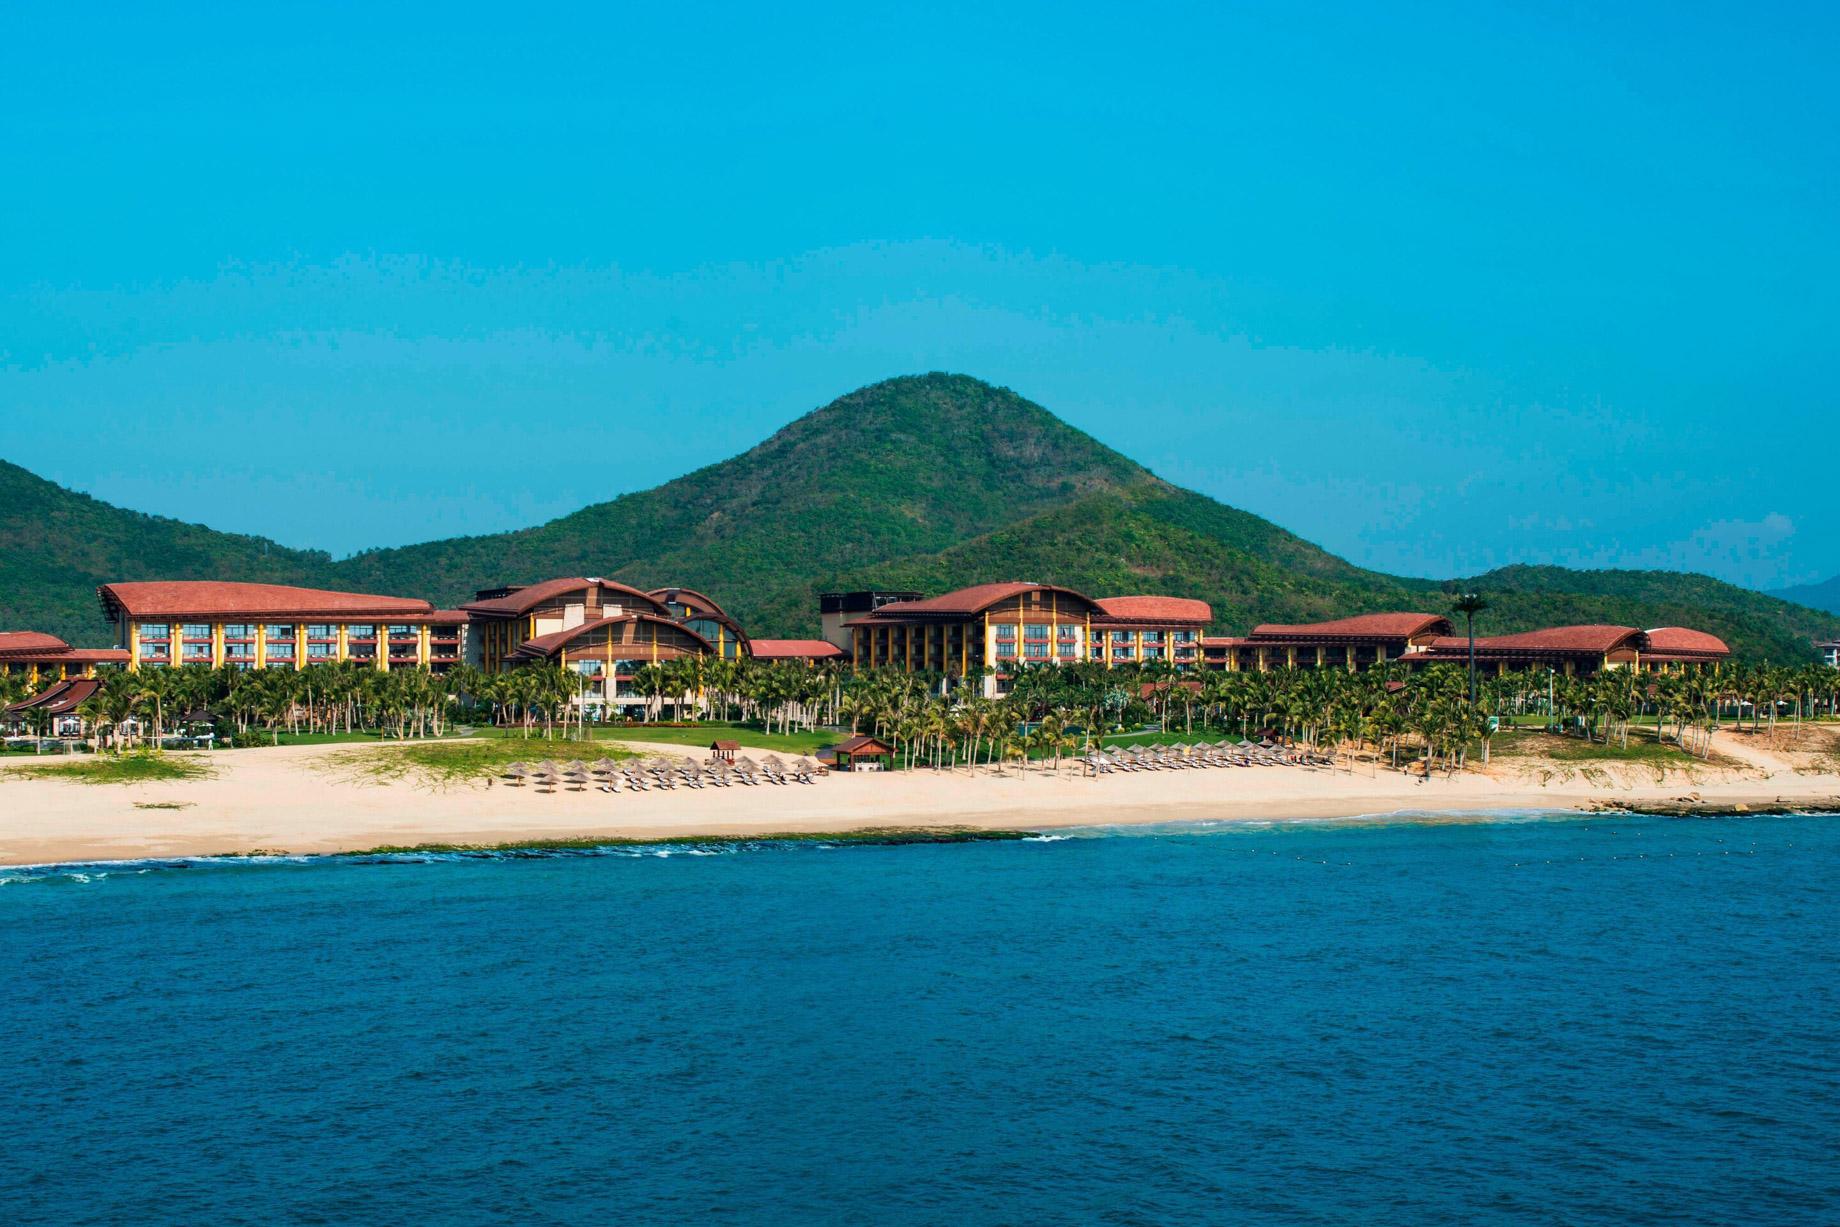 The St. Regis Sanya Yalong Bay Luxury Resort - Hainan, China - Yalong Bay Resort Beach View Aerial